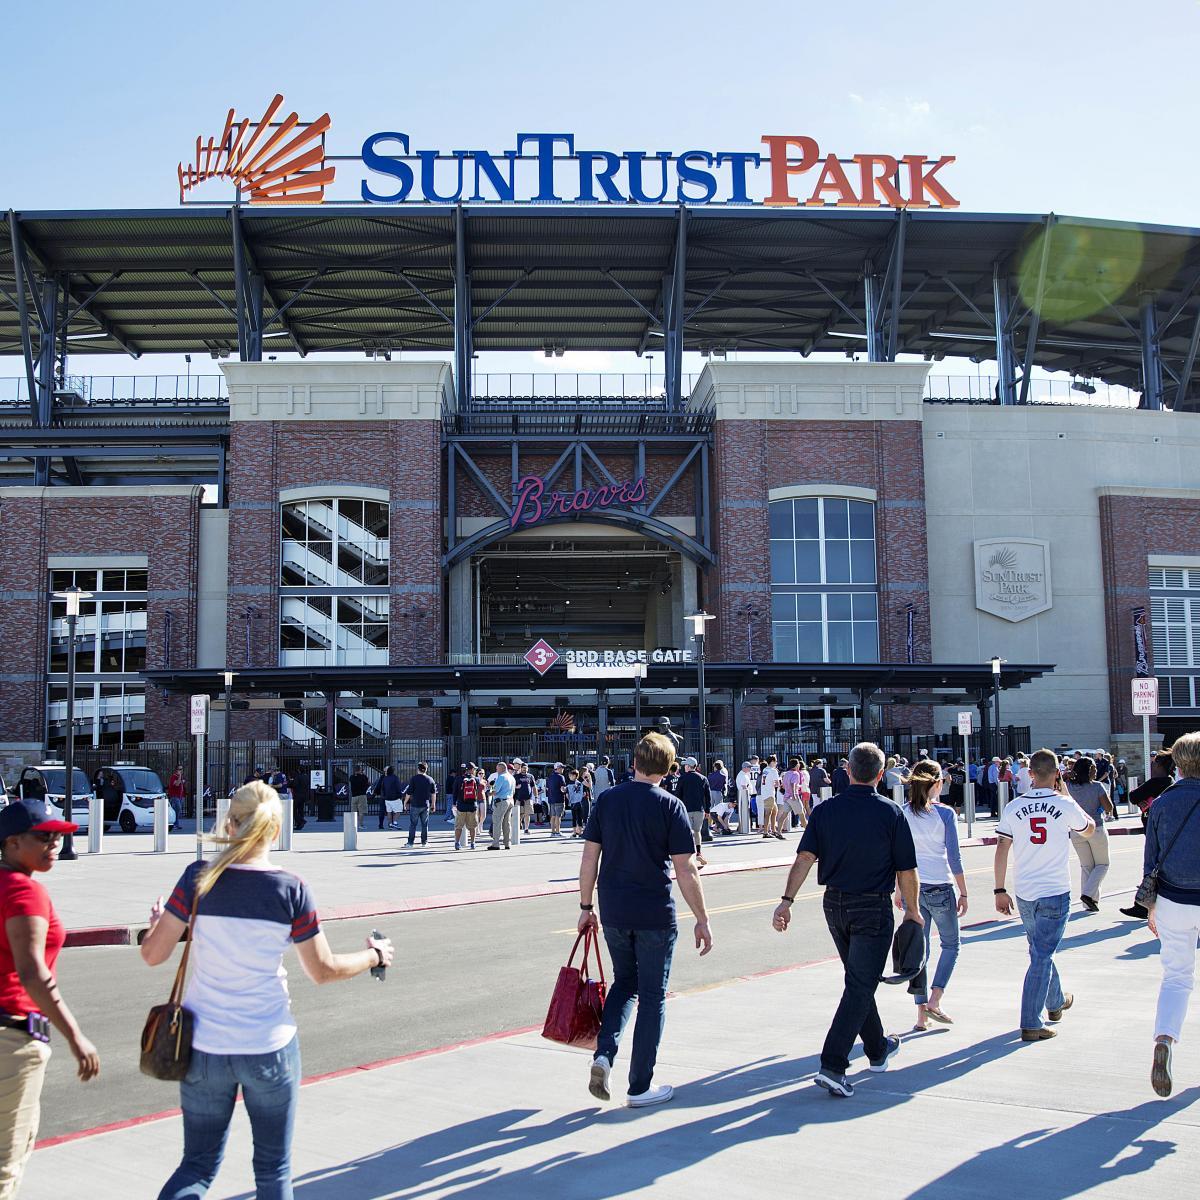 Dead Body of Contractor Found in Freezer at Atlanta Braves' SunTrust Park